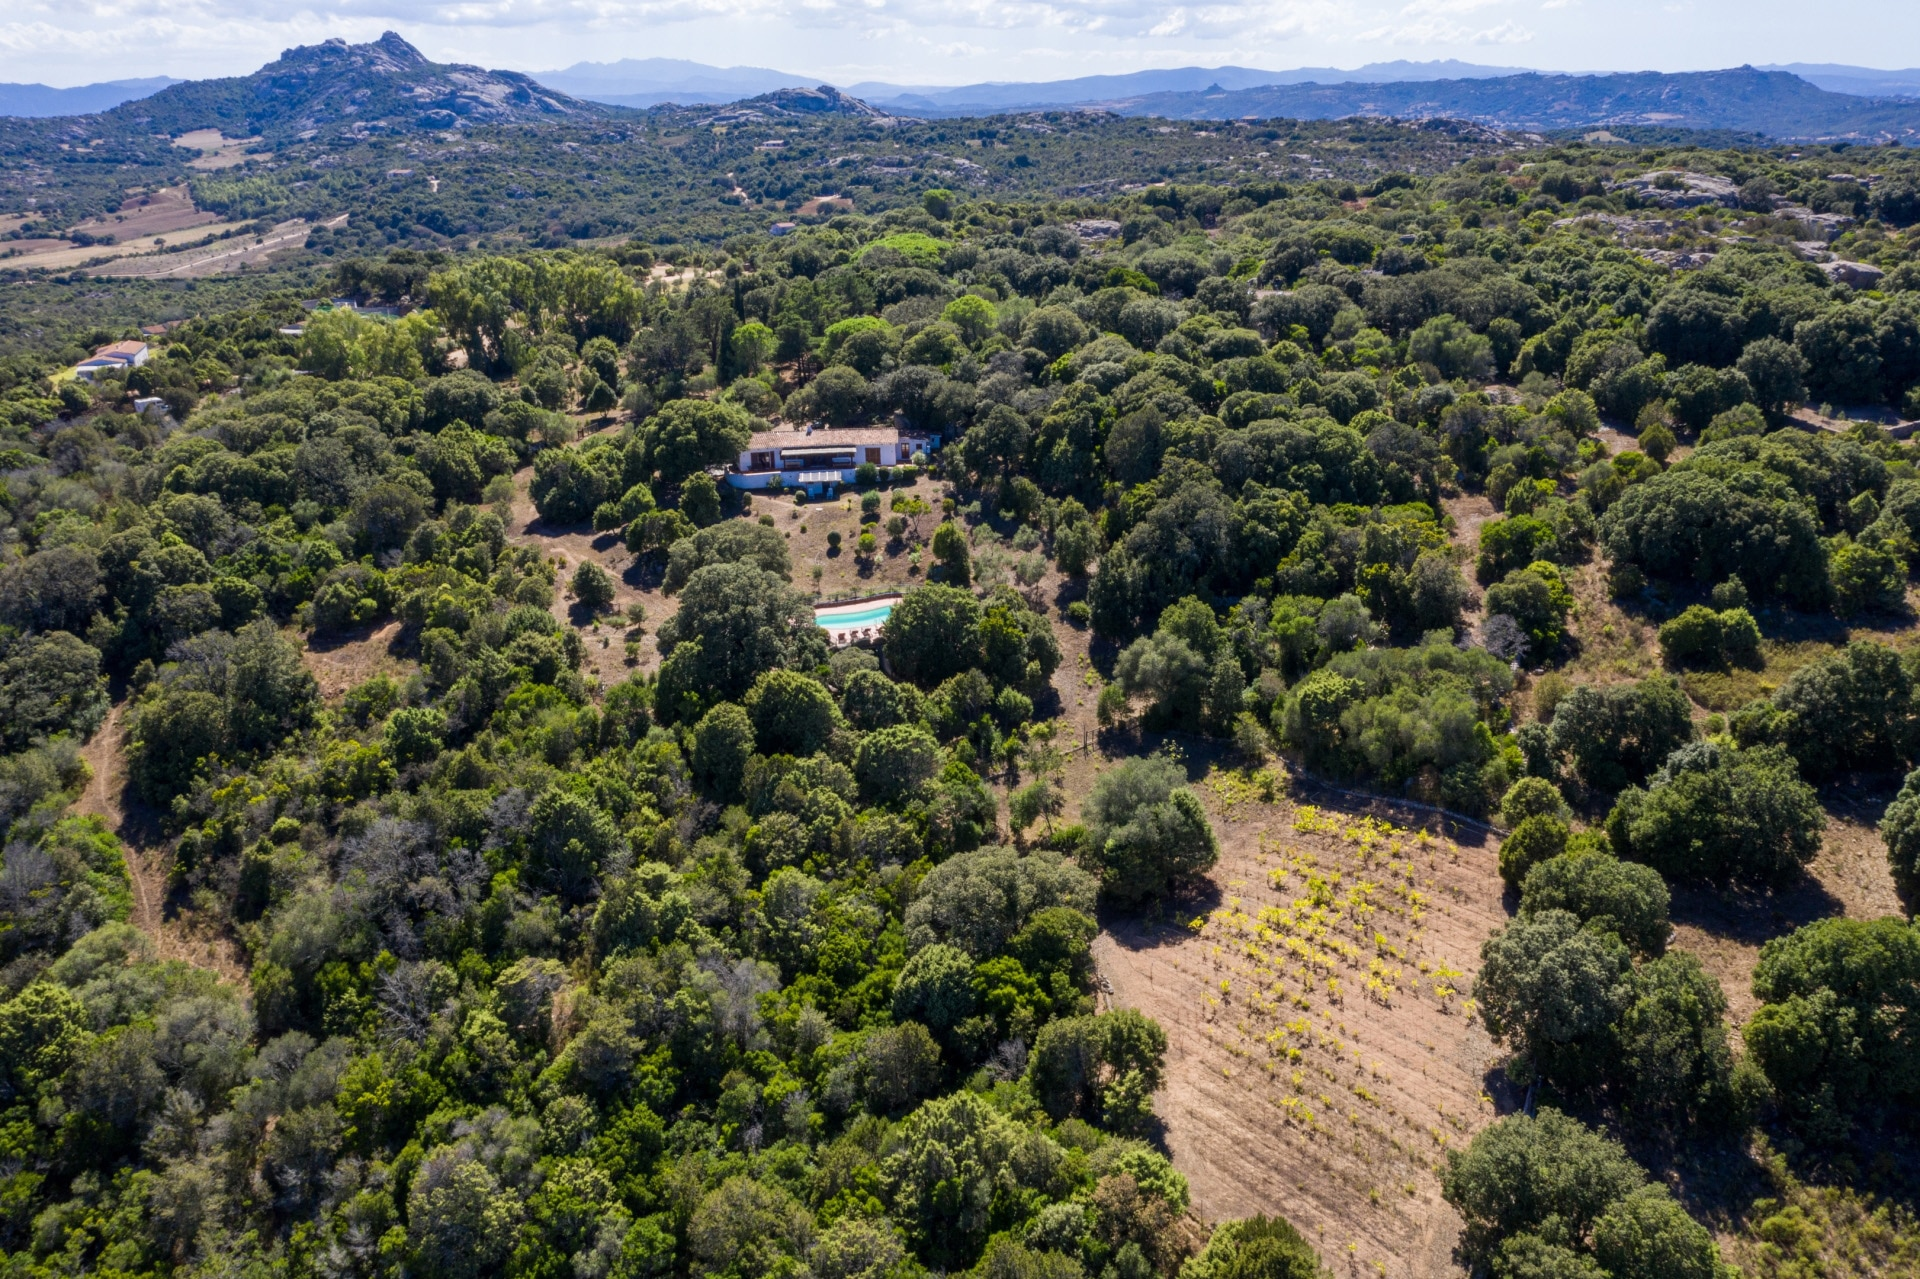 A curated selection of Stazzi-Villas in Gallura – Costa Smeralda